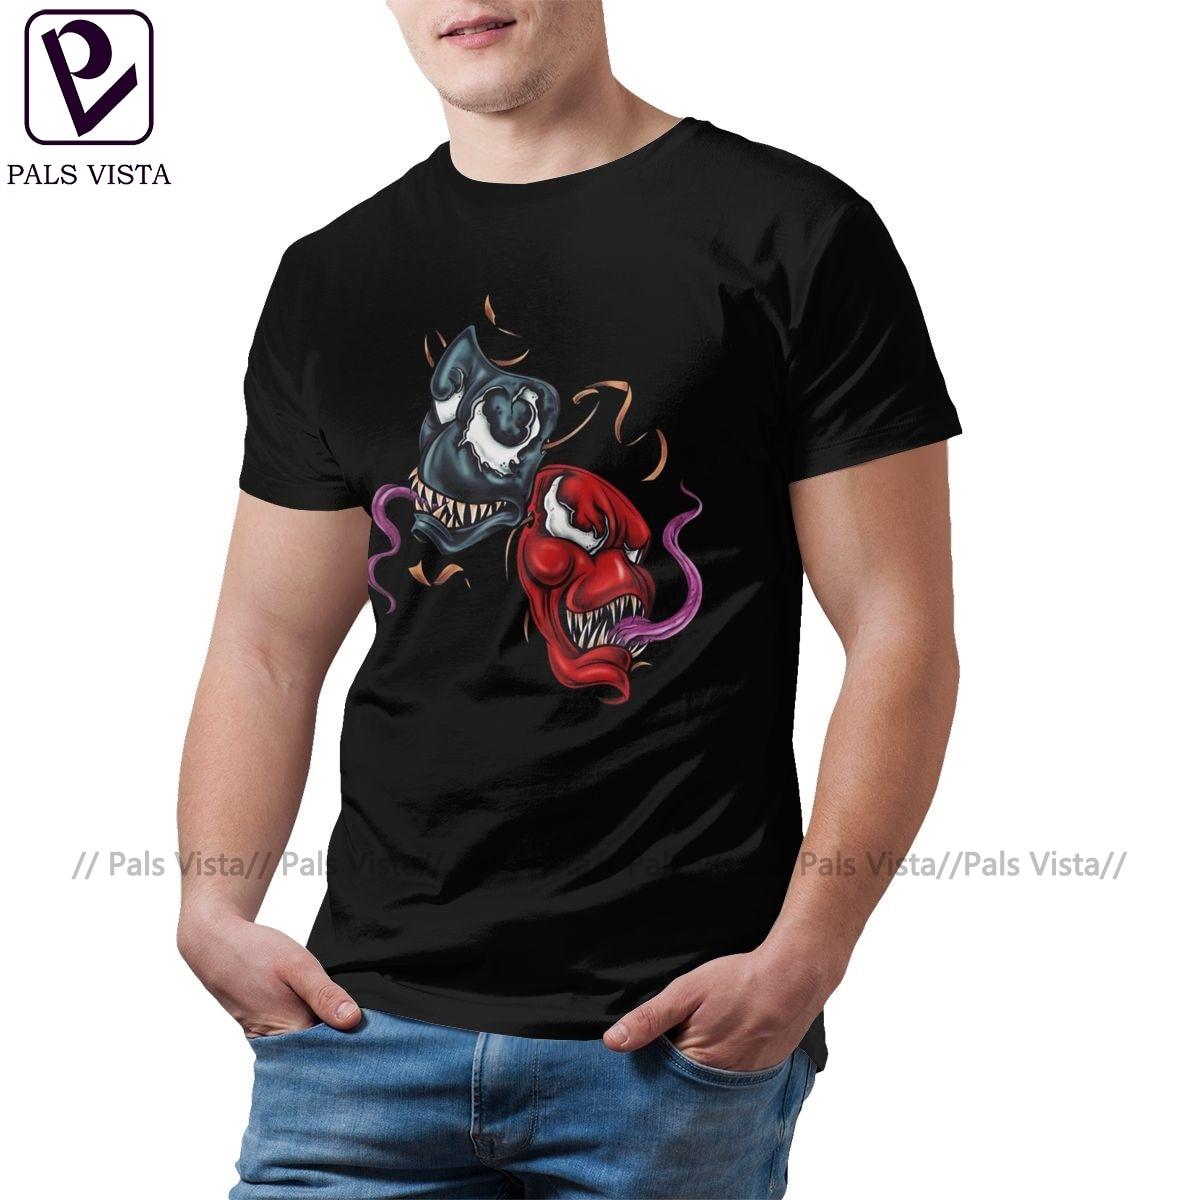 Camiseta Tom Hardy camiseta H tatuaje camiseta hombres impresionante camiseta 100 algodón playa camiseta gráfica de gran tamaño